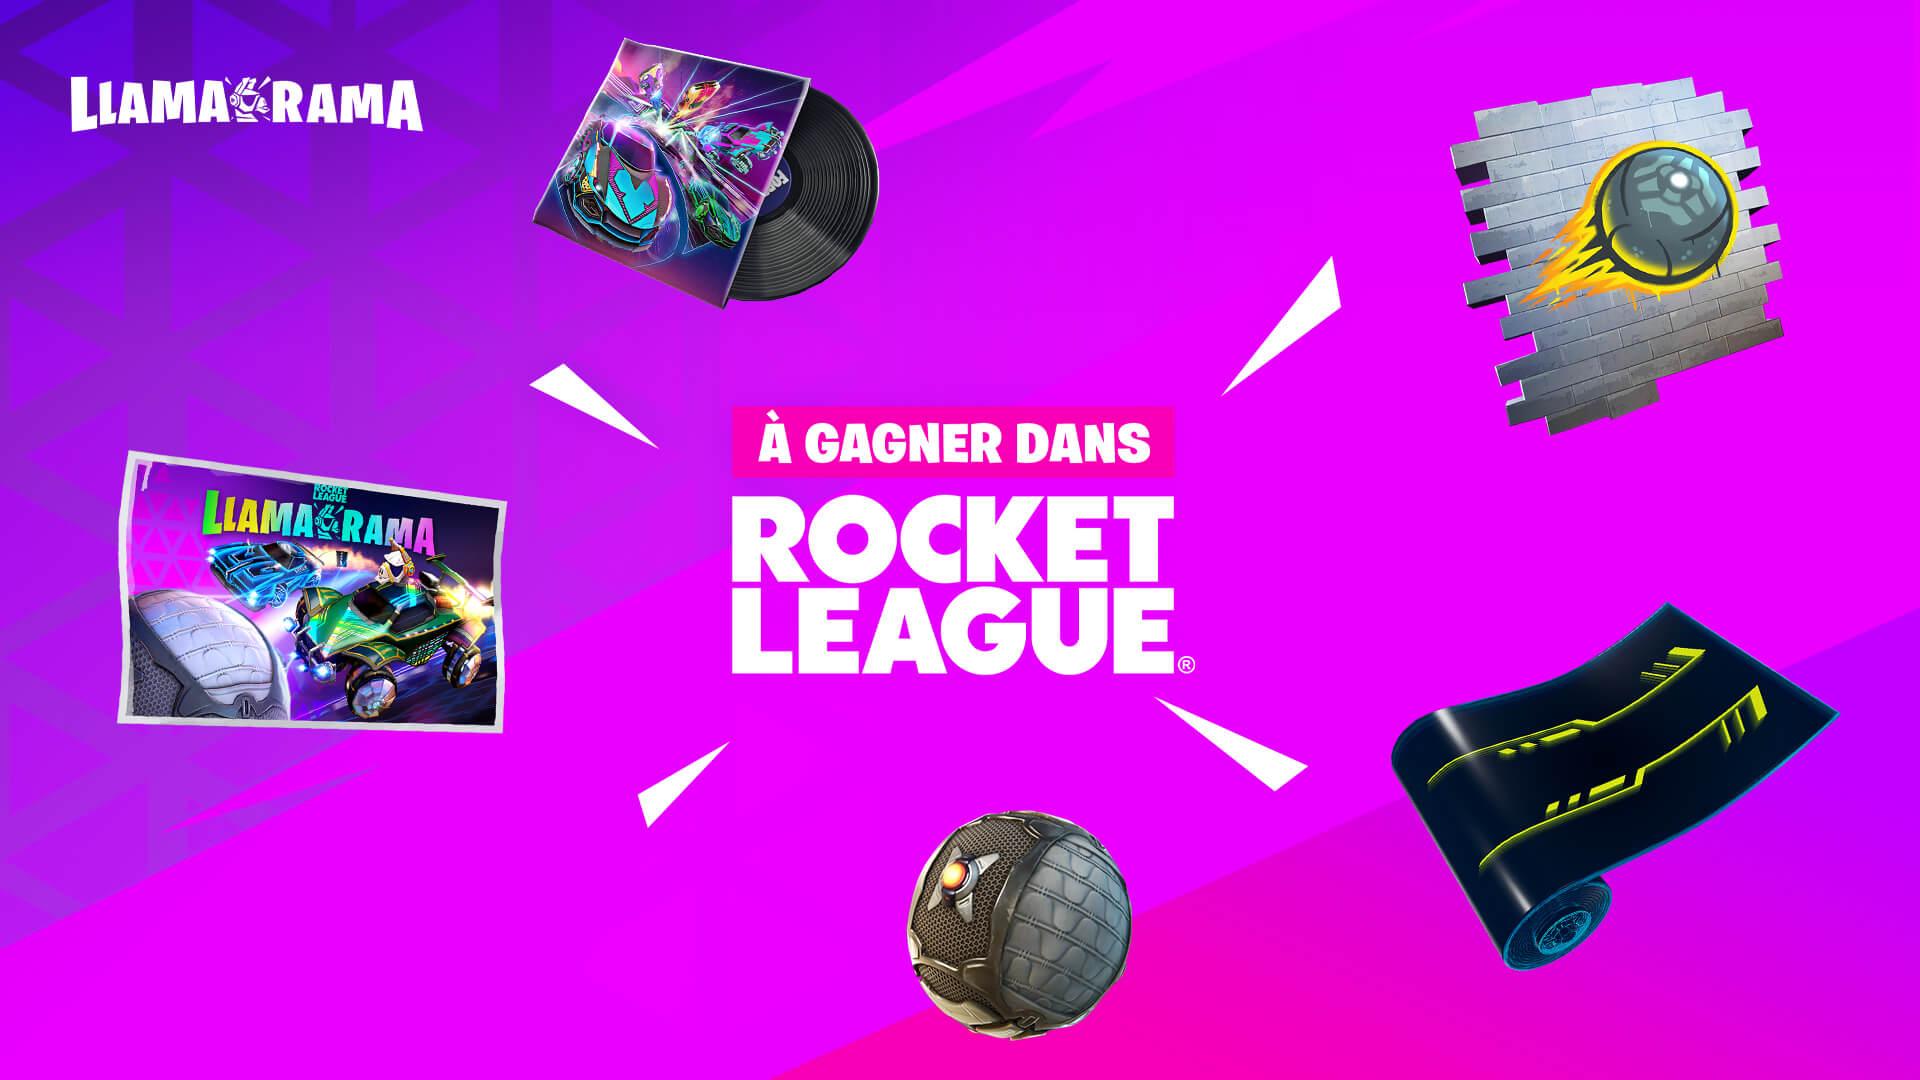 FR 16BR RocketLeague Llama Rama Rewards V2 Social